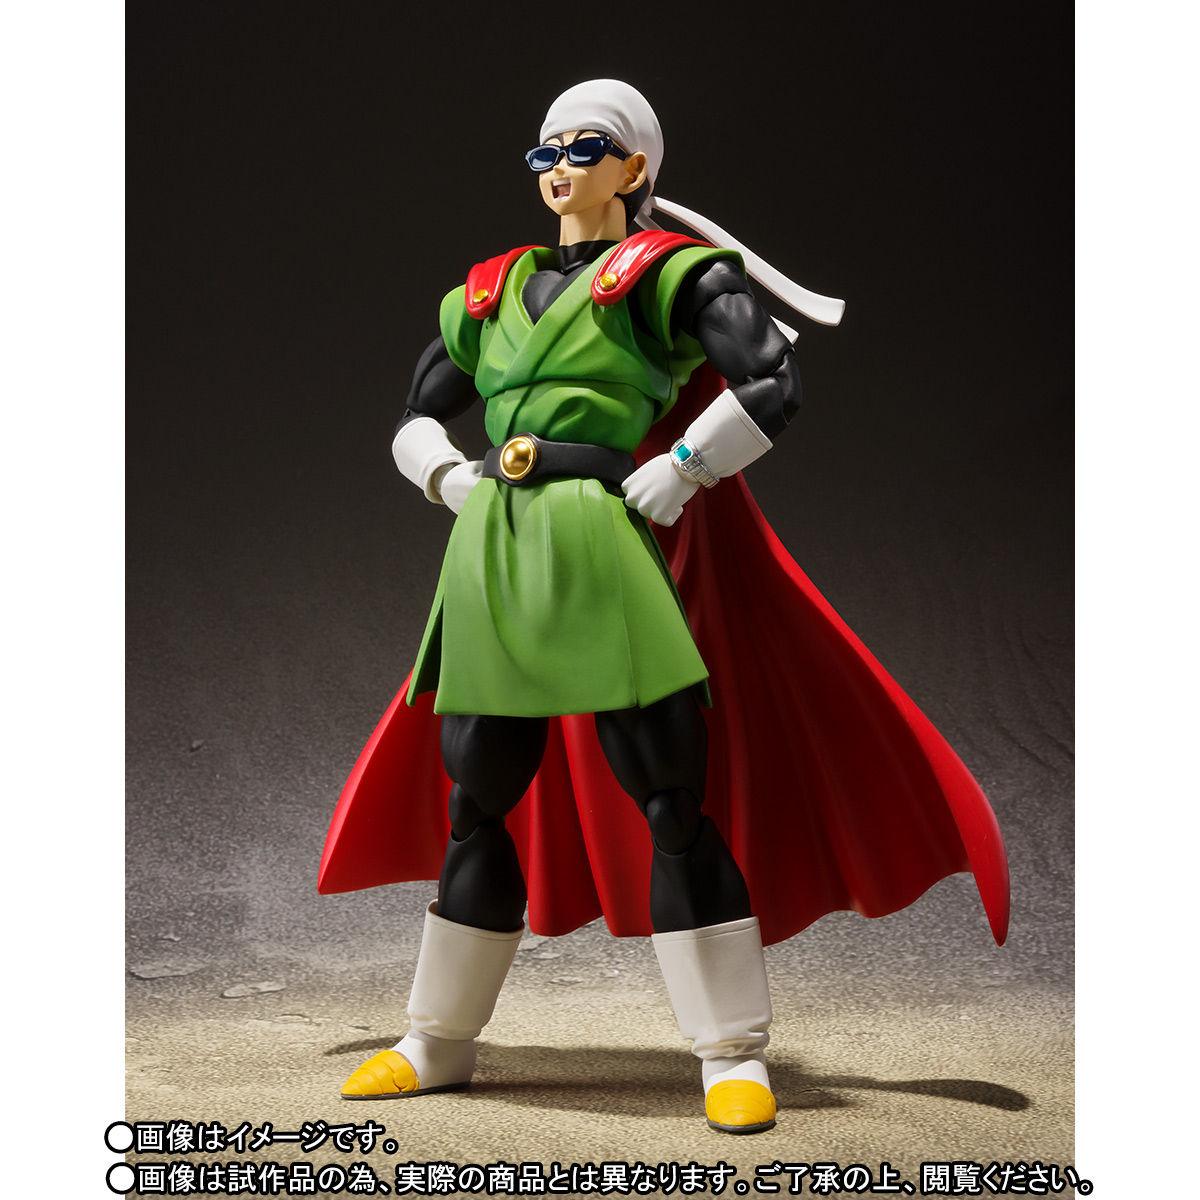 S.H.フィギュアーツ『グレートサイヤマン』ドラゴンボールZ 可動フィギュア-006